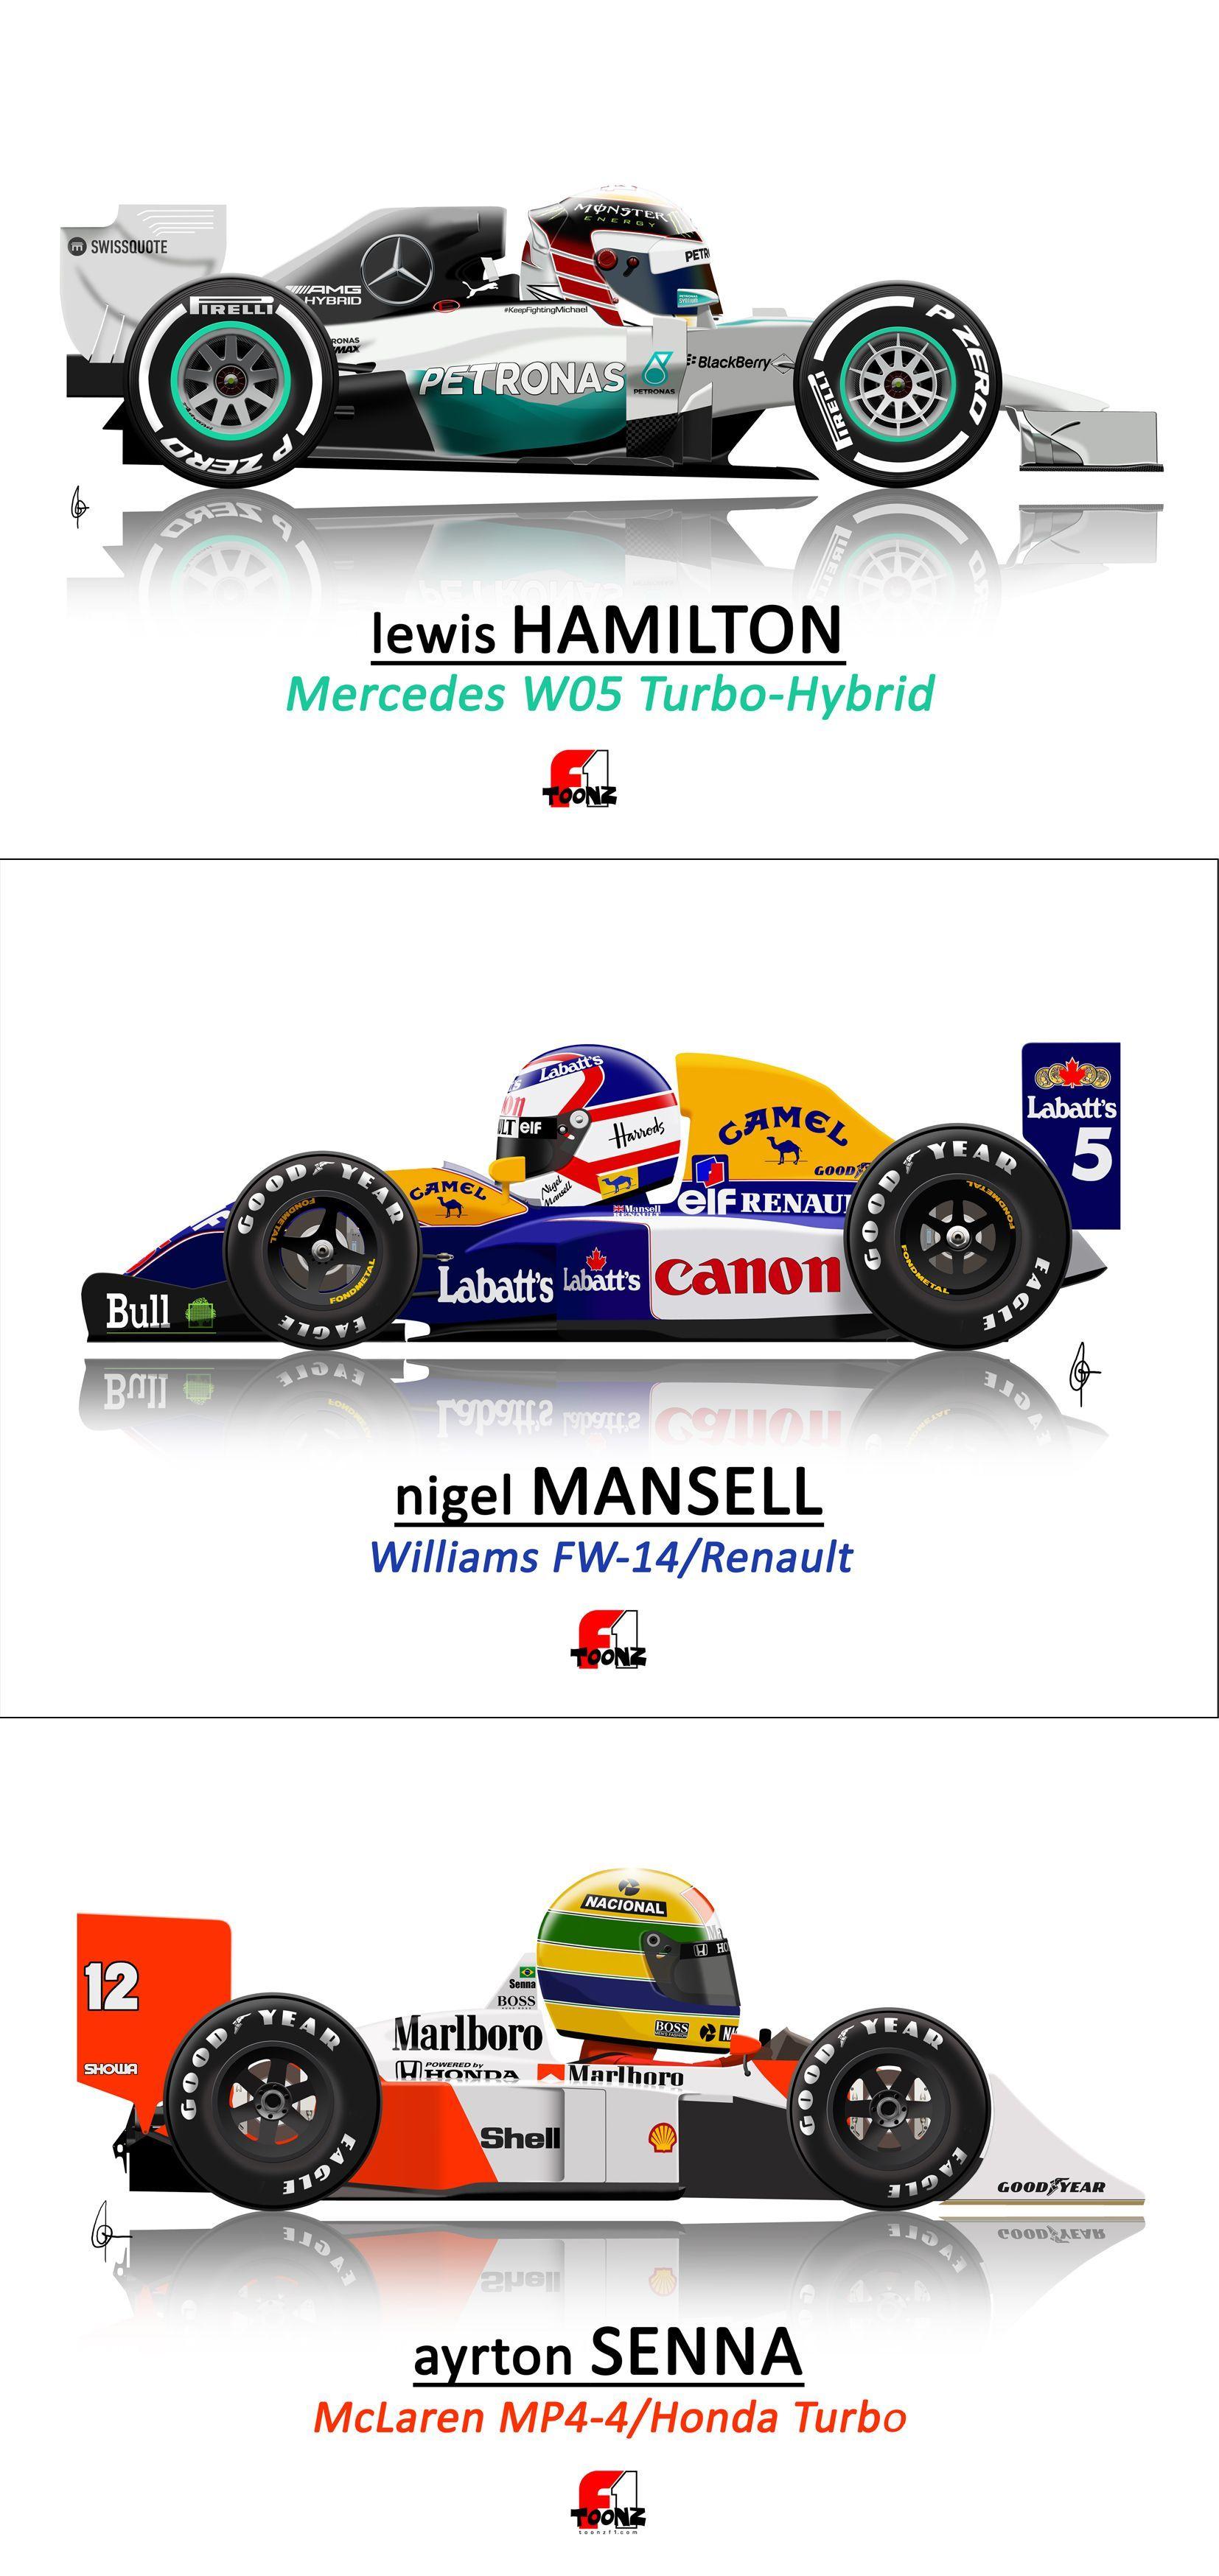 Tooned Lewis Hamilton Nigel Mansell Ayrton Senna With Images